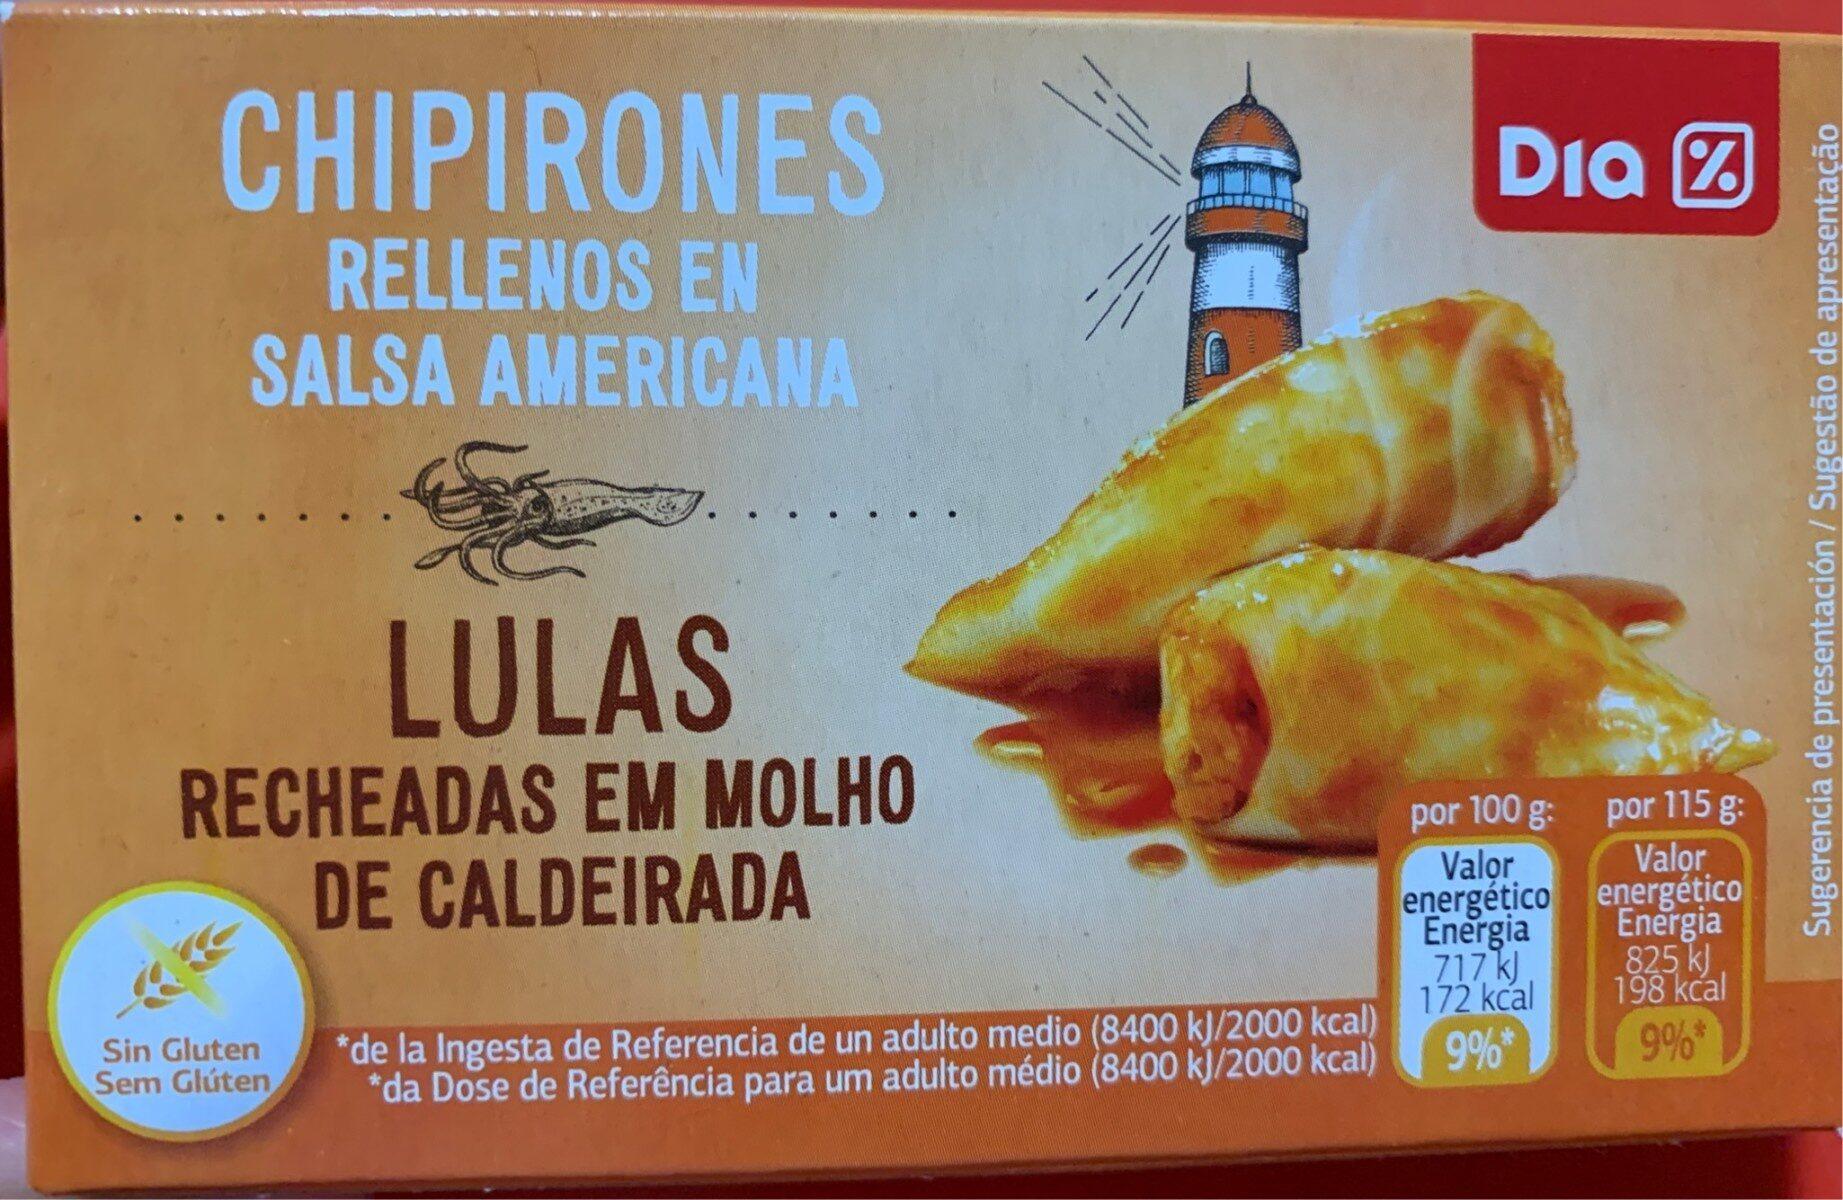 Chipirones rellenos en salsa americana - Produit - es